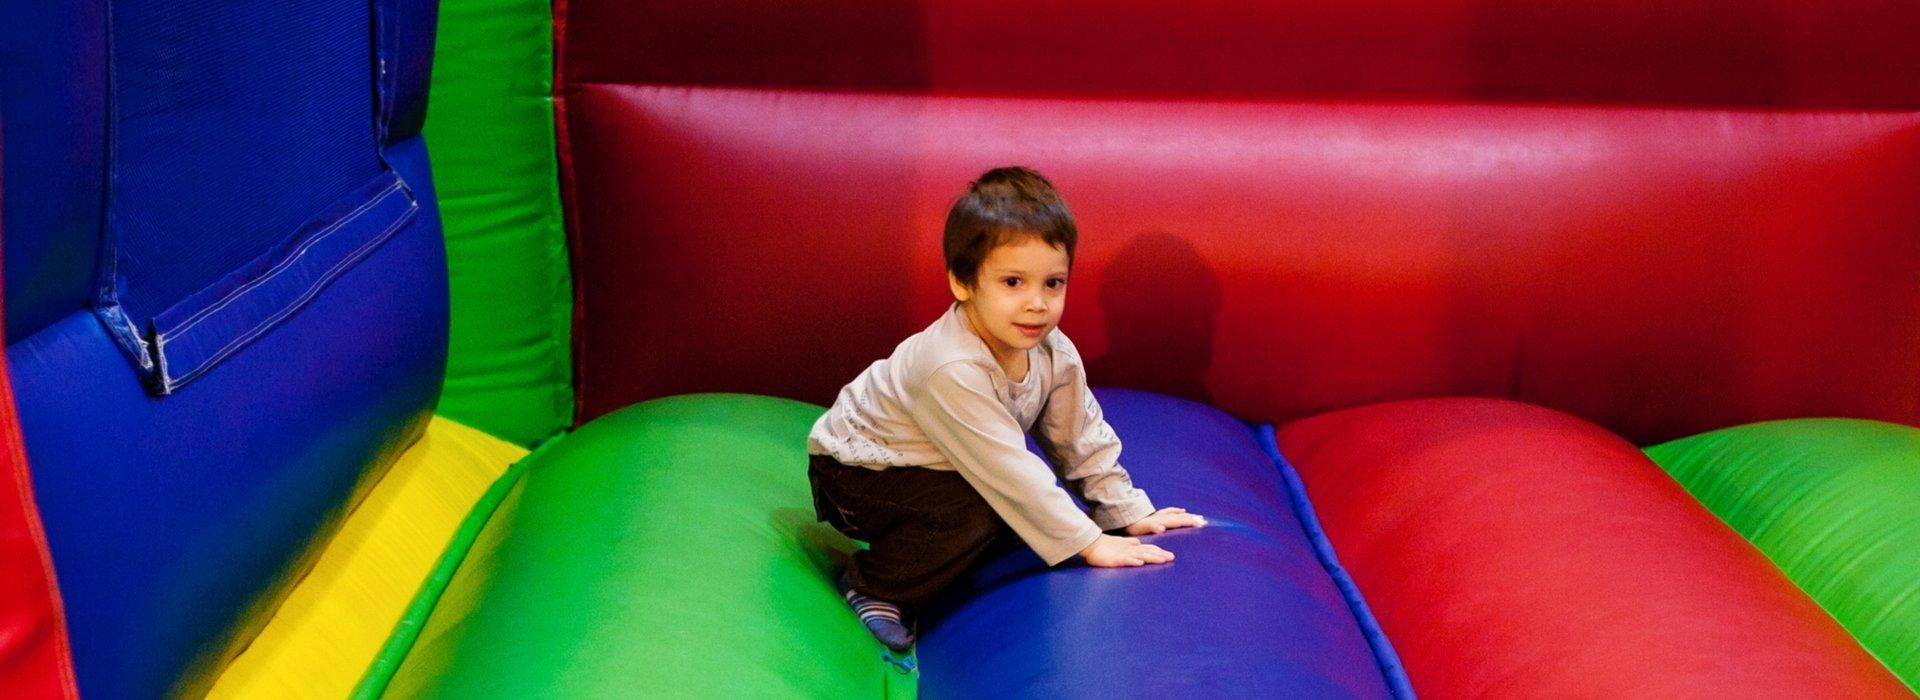 Budapesti Programok Gyerekekkel - Események Budapesten